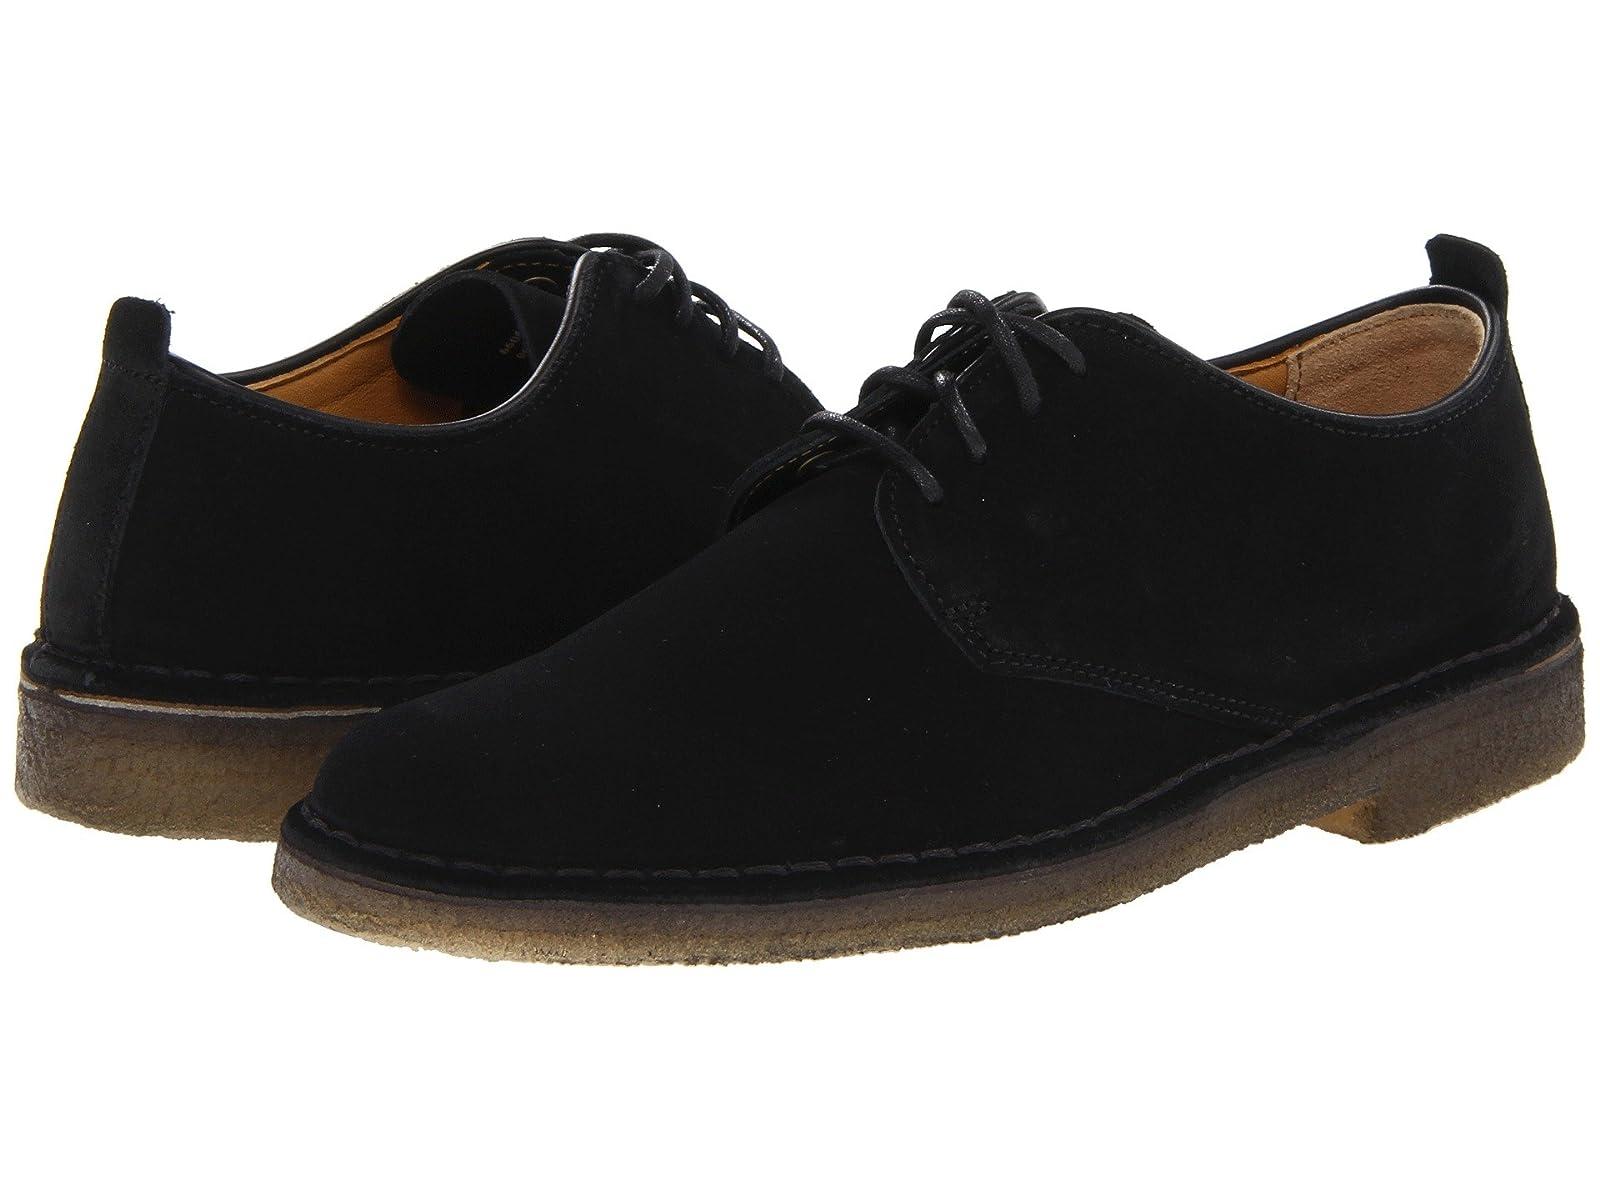 Clarks Desert LondonAtmospheric grades have affordable shoes